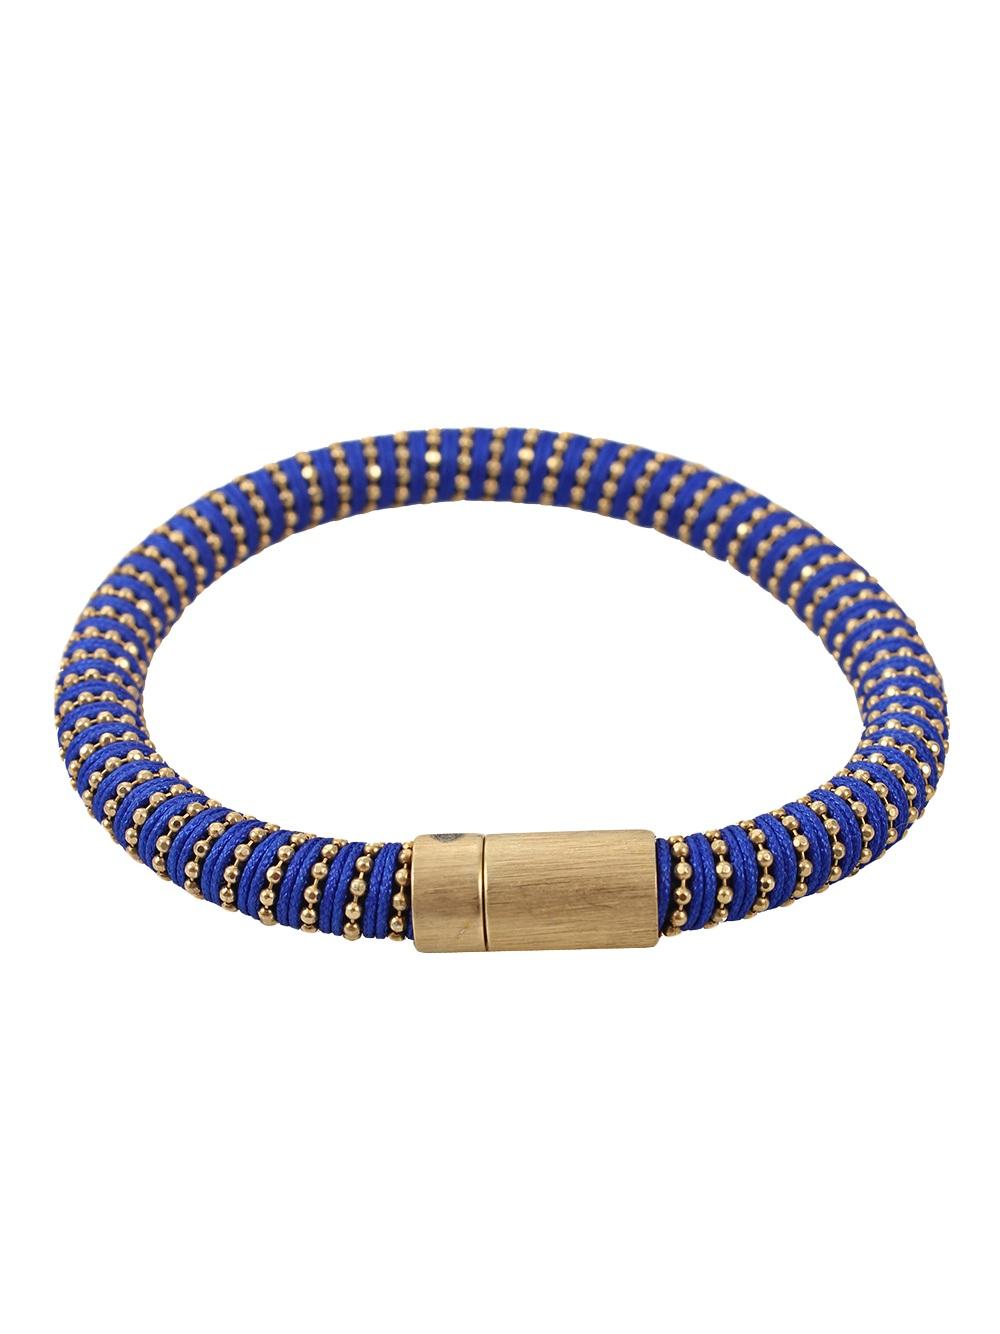 carolina bucci beaded band bracelet in gold